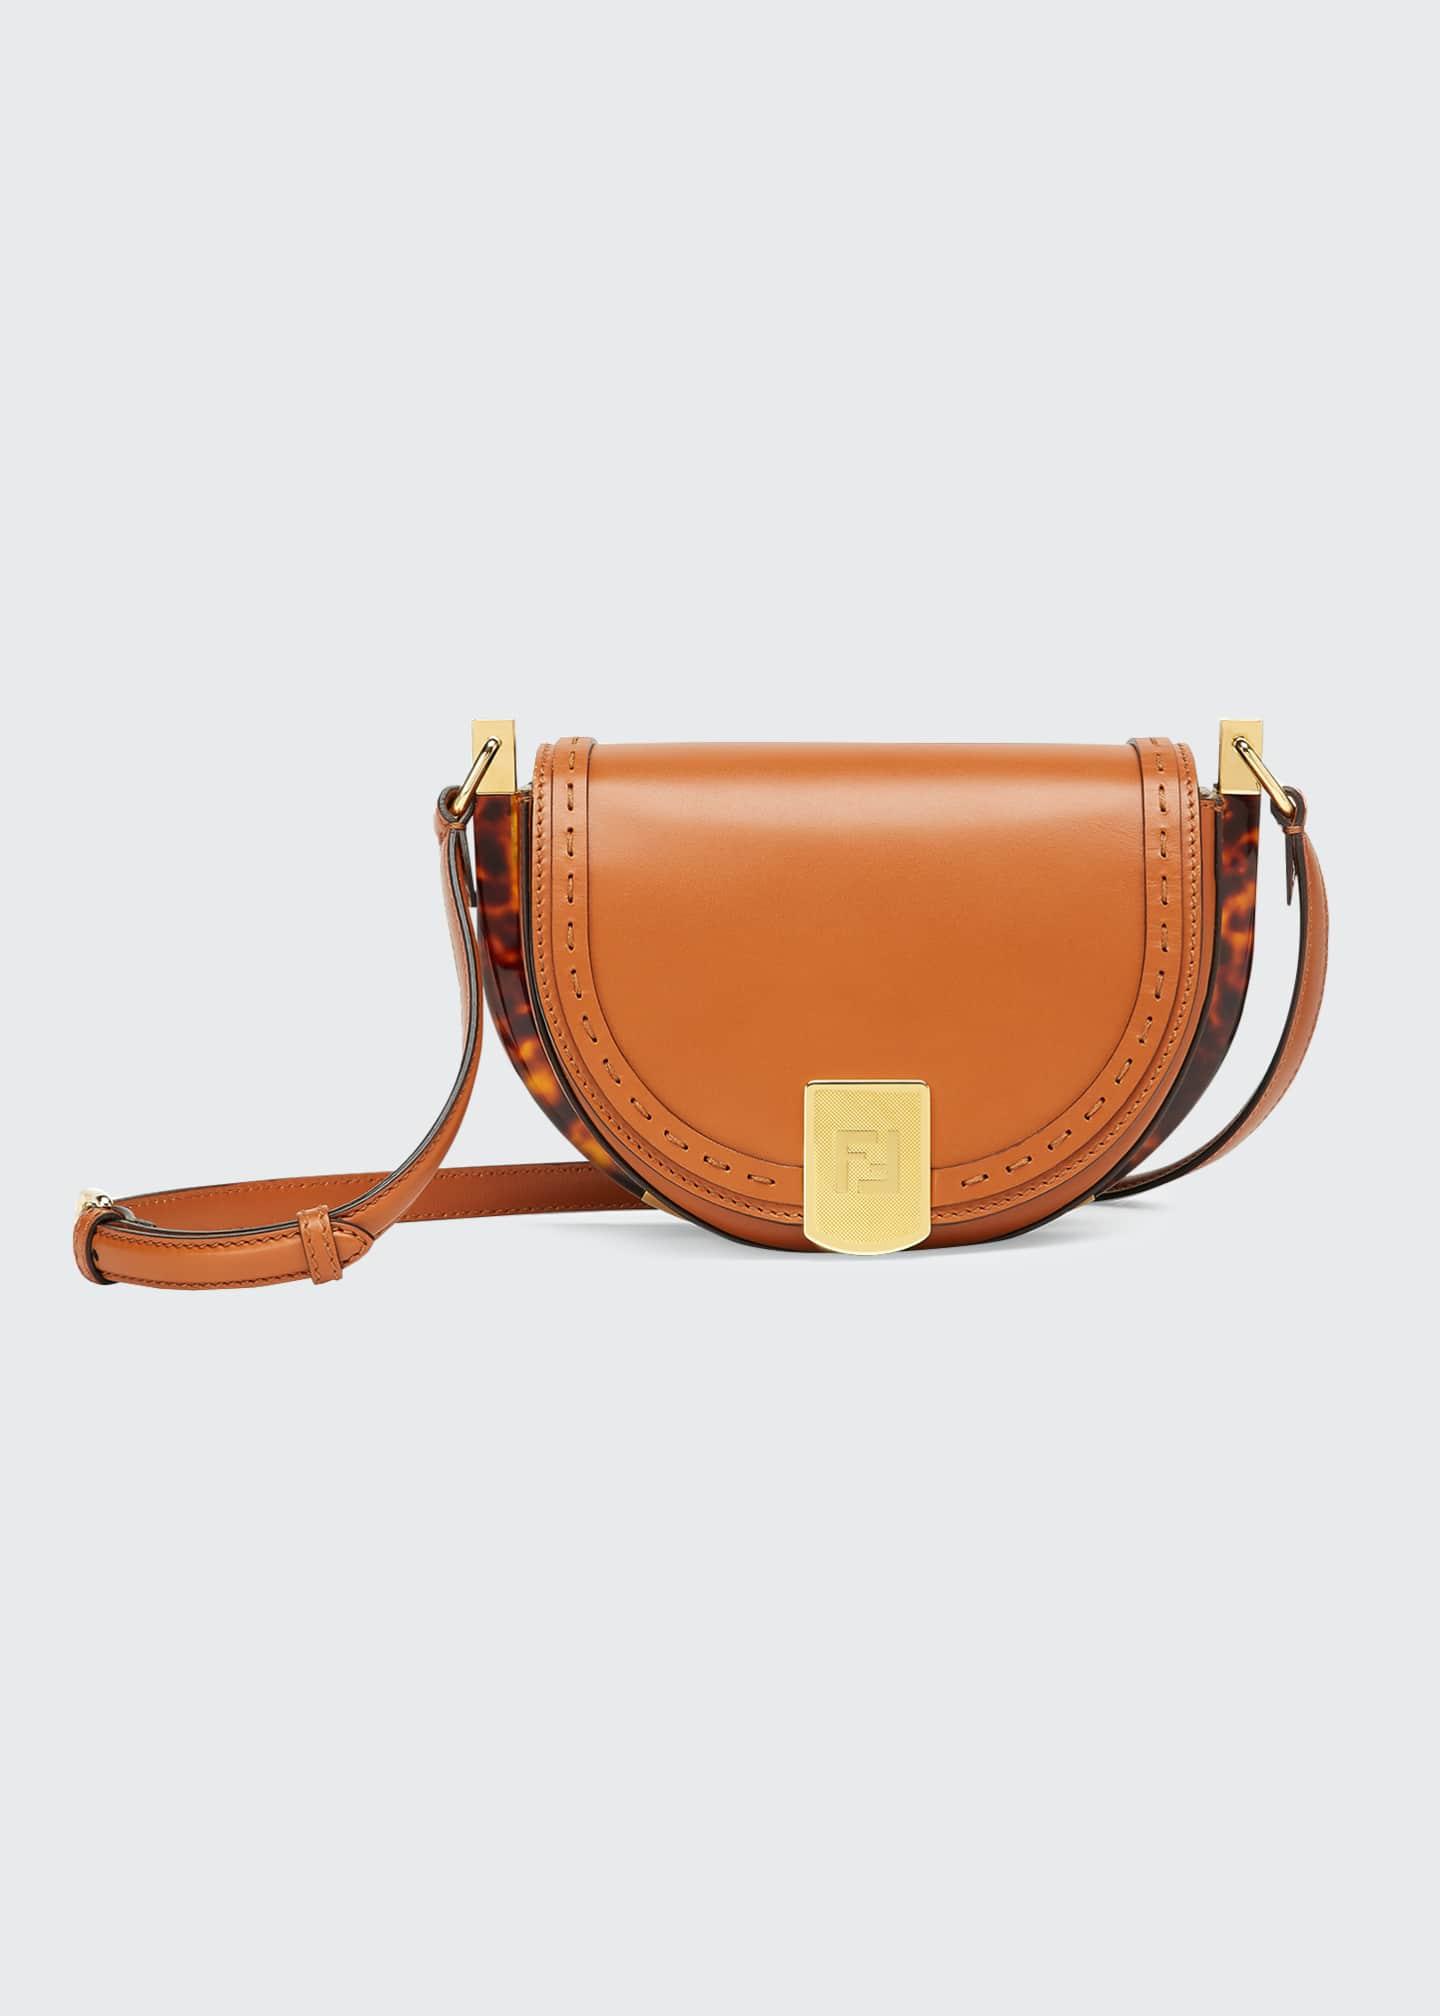 Moonlight Saddle Crossbody Bag by Fendi, available on bergdorfgoodman.com for $2100 Olivia Culpo Bags Exact Product